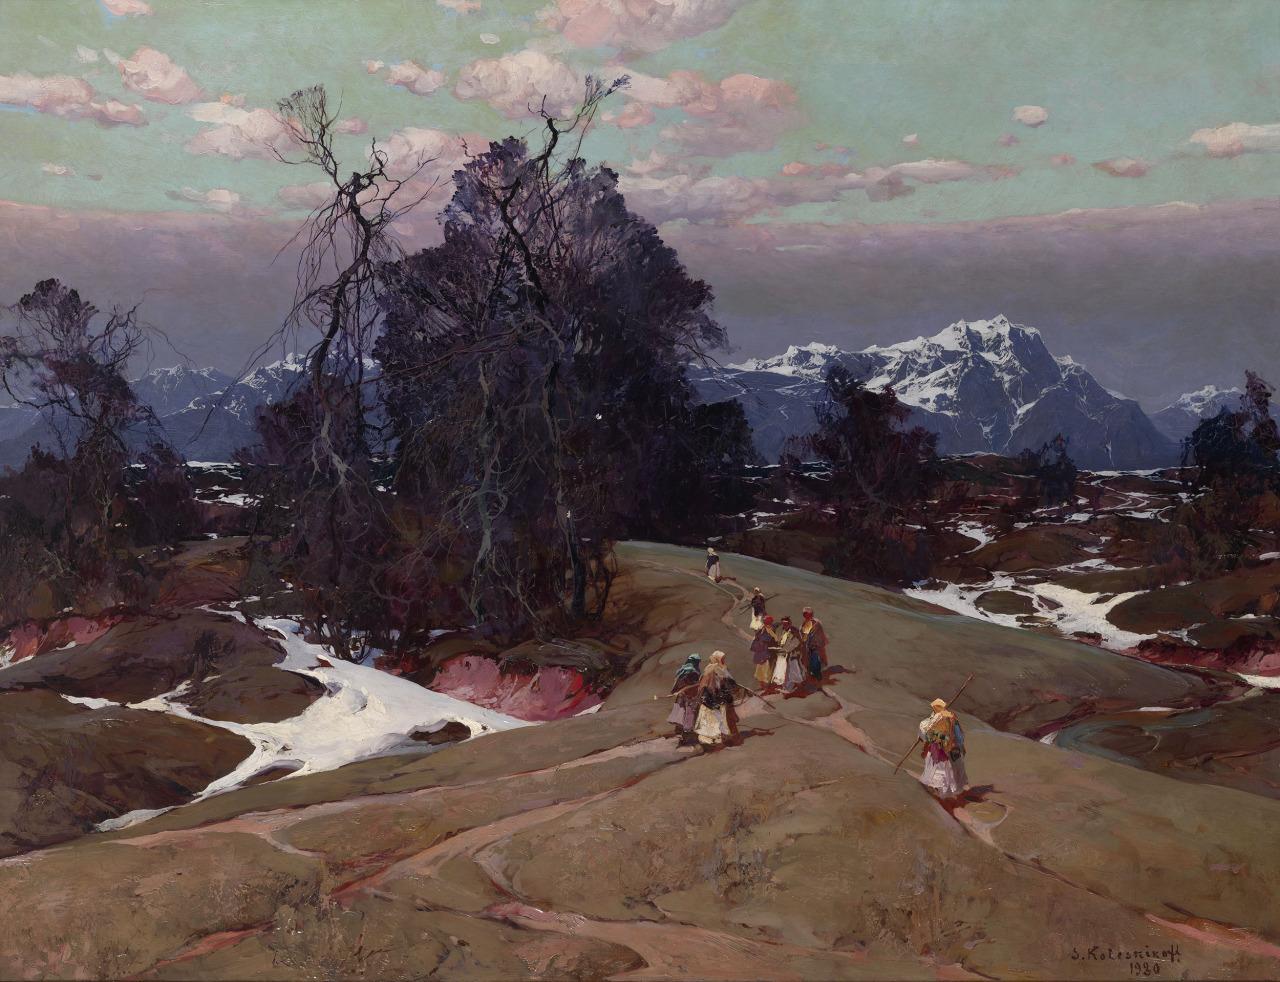 Stepan Kolesnikov - Mountain landscape, 1930